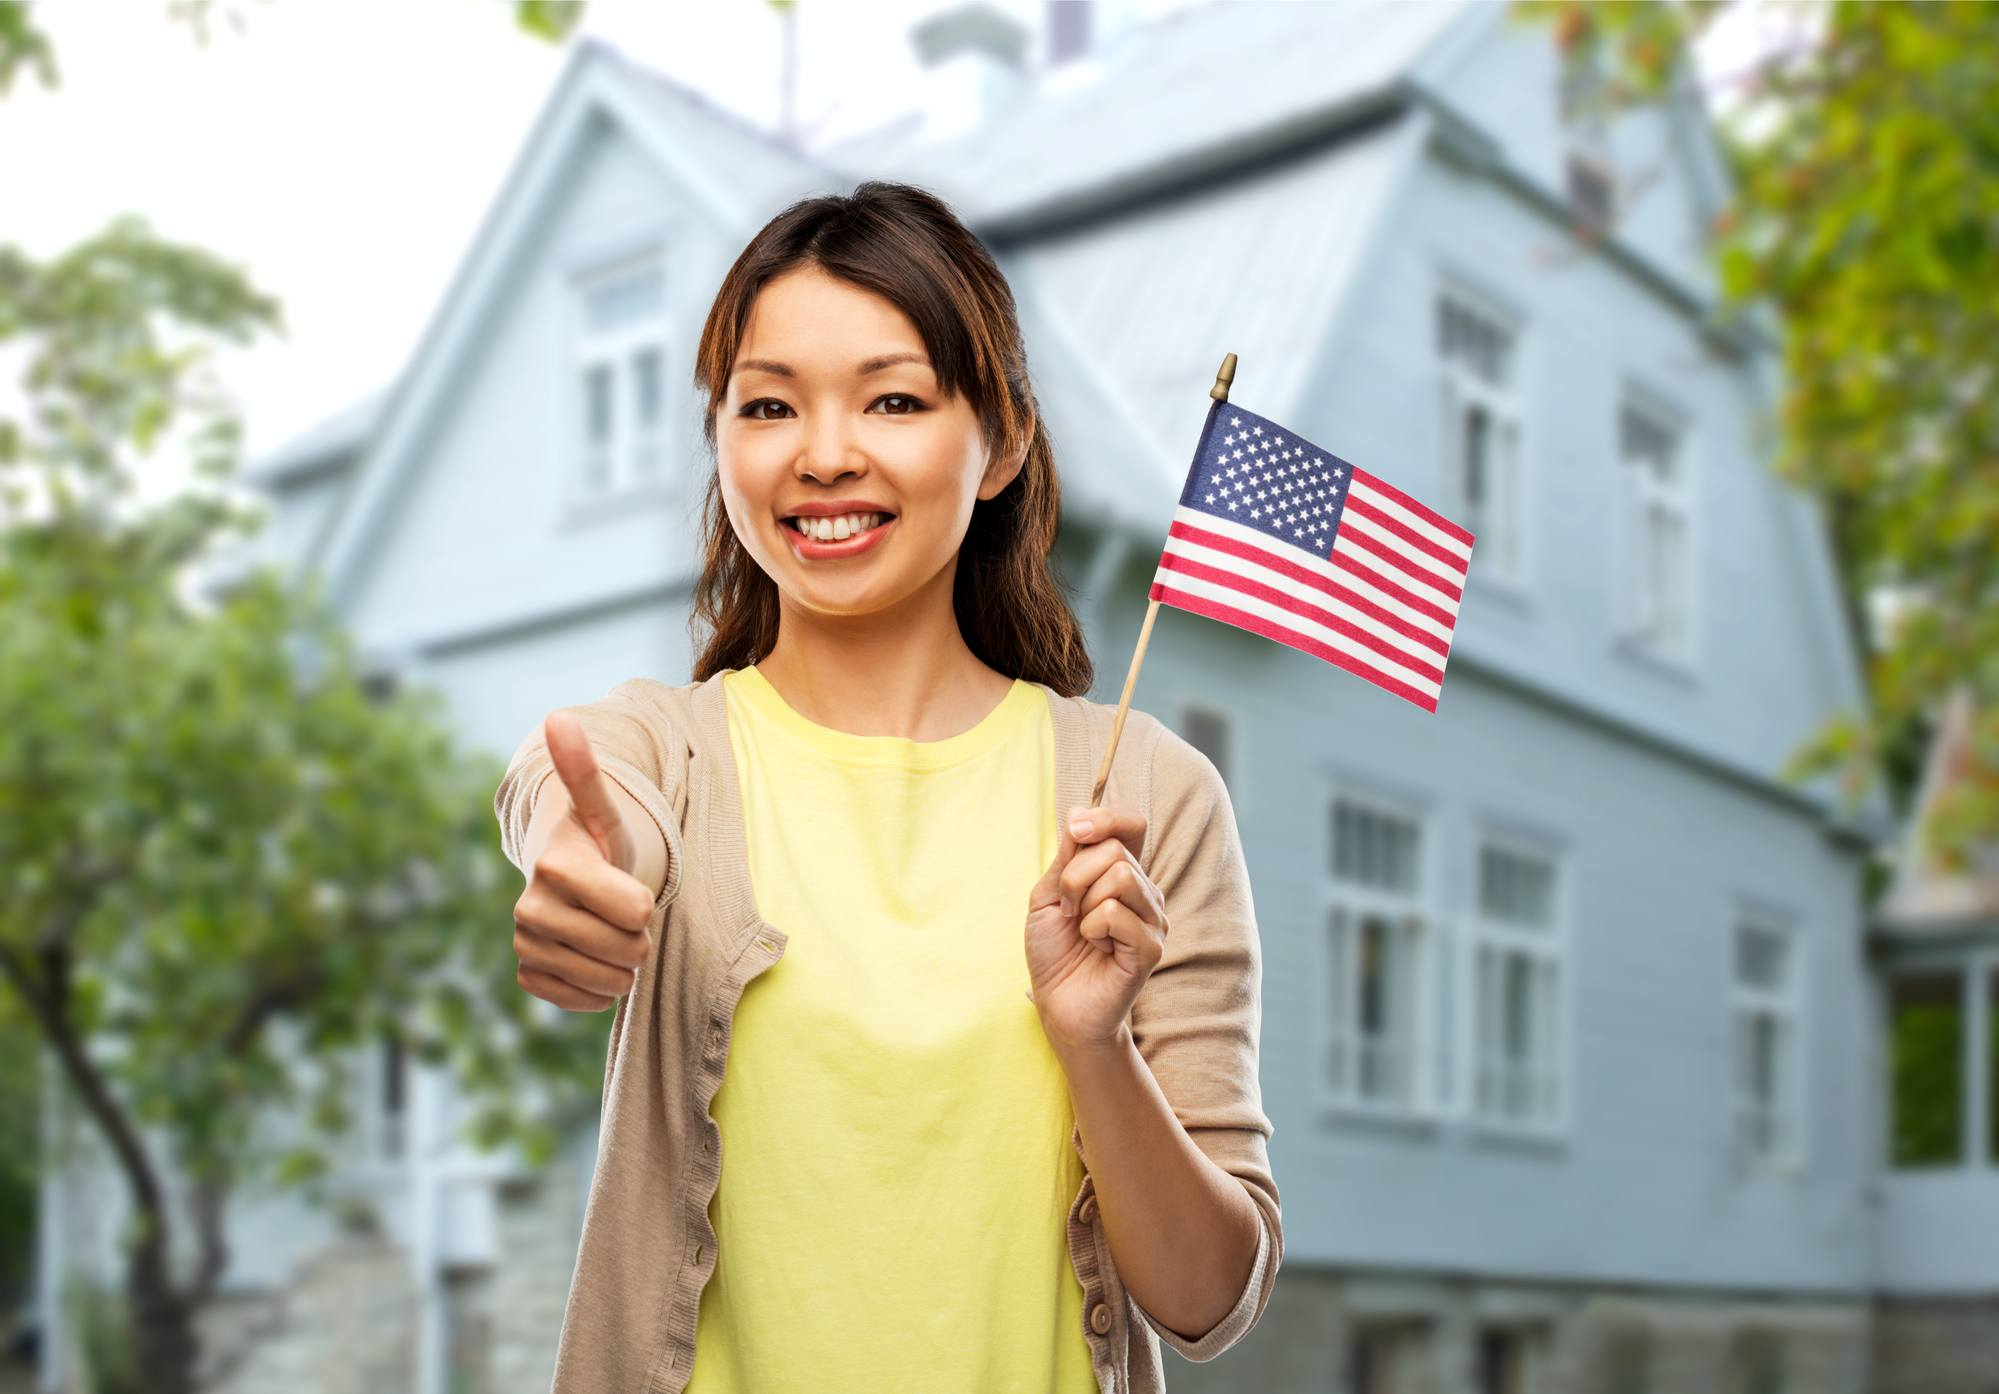 American Asian woman